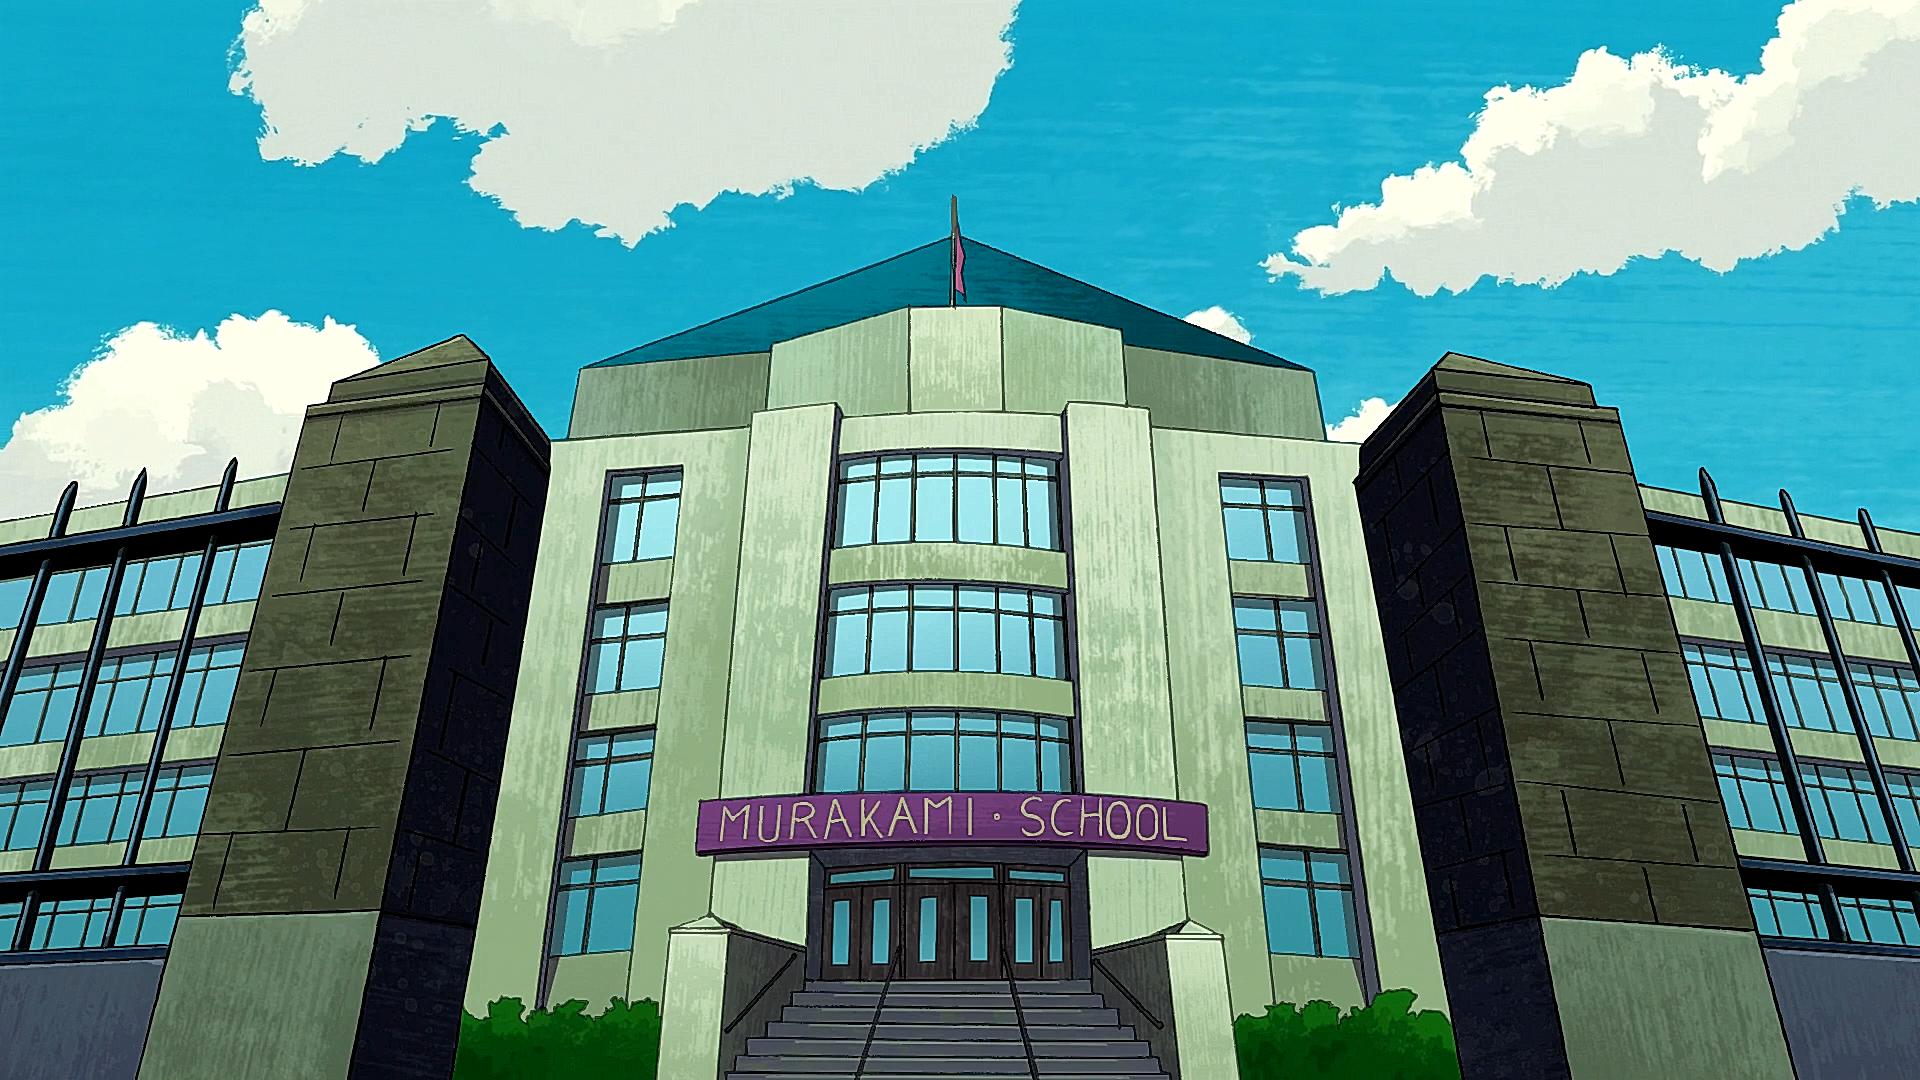 Murakami School